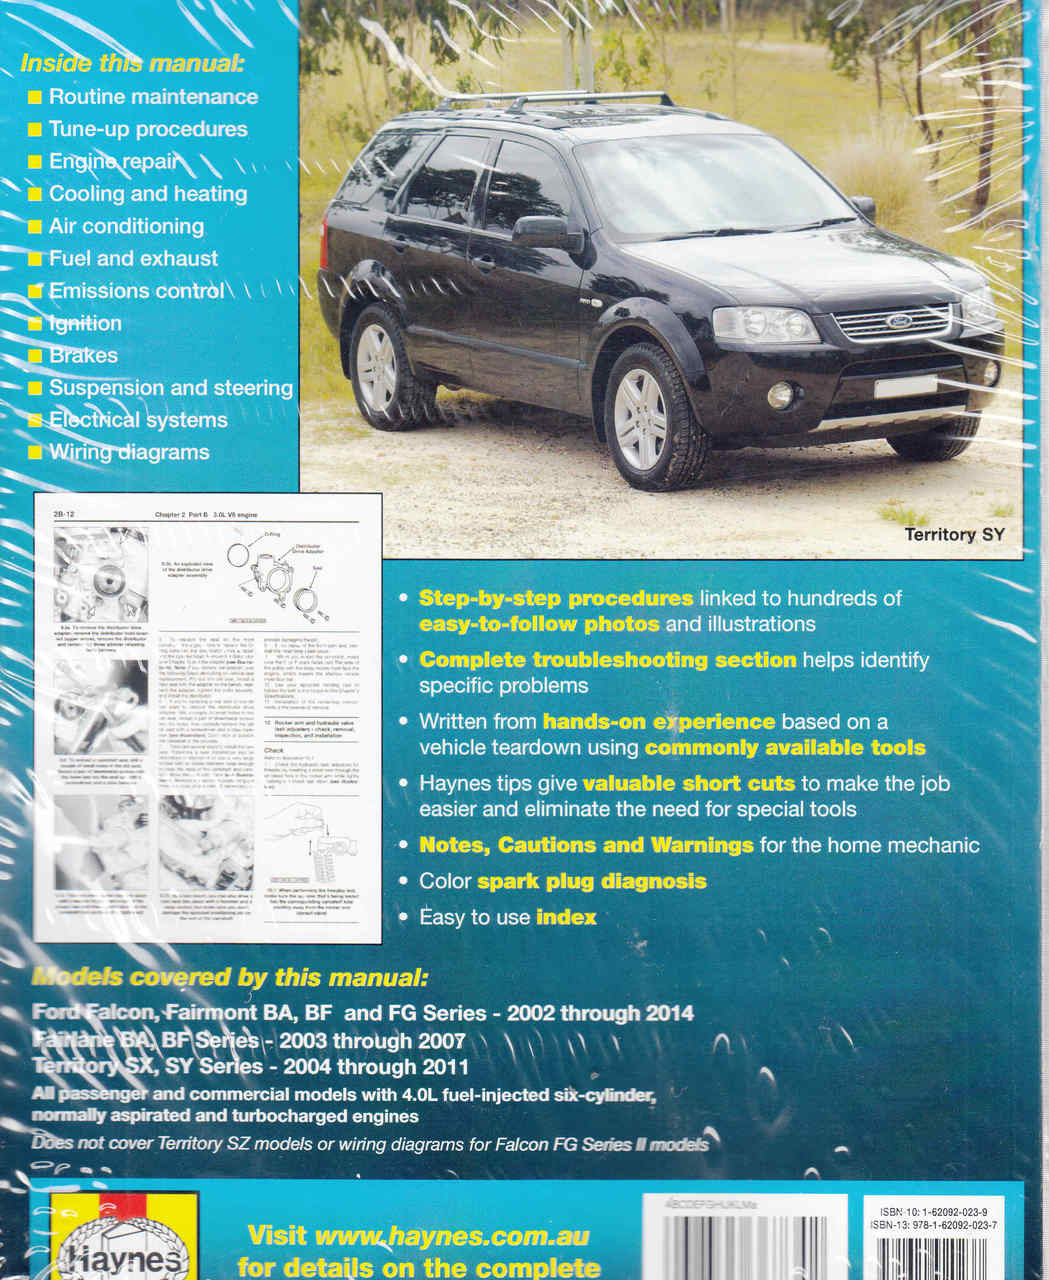 2013 Ford Explorer Electrical Wiring Diagrams Original Factory Manual